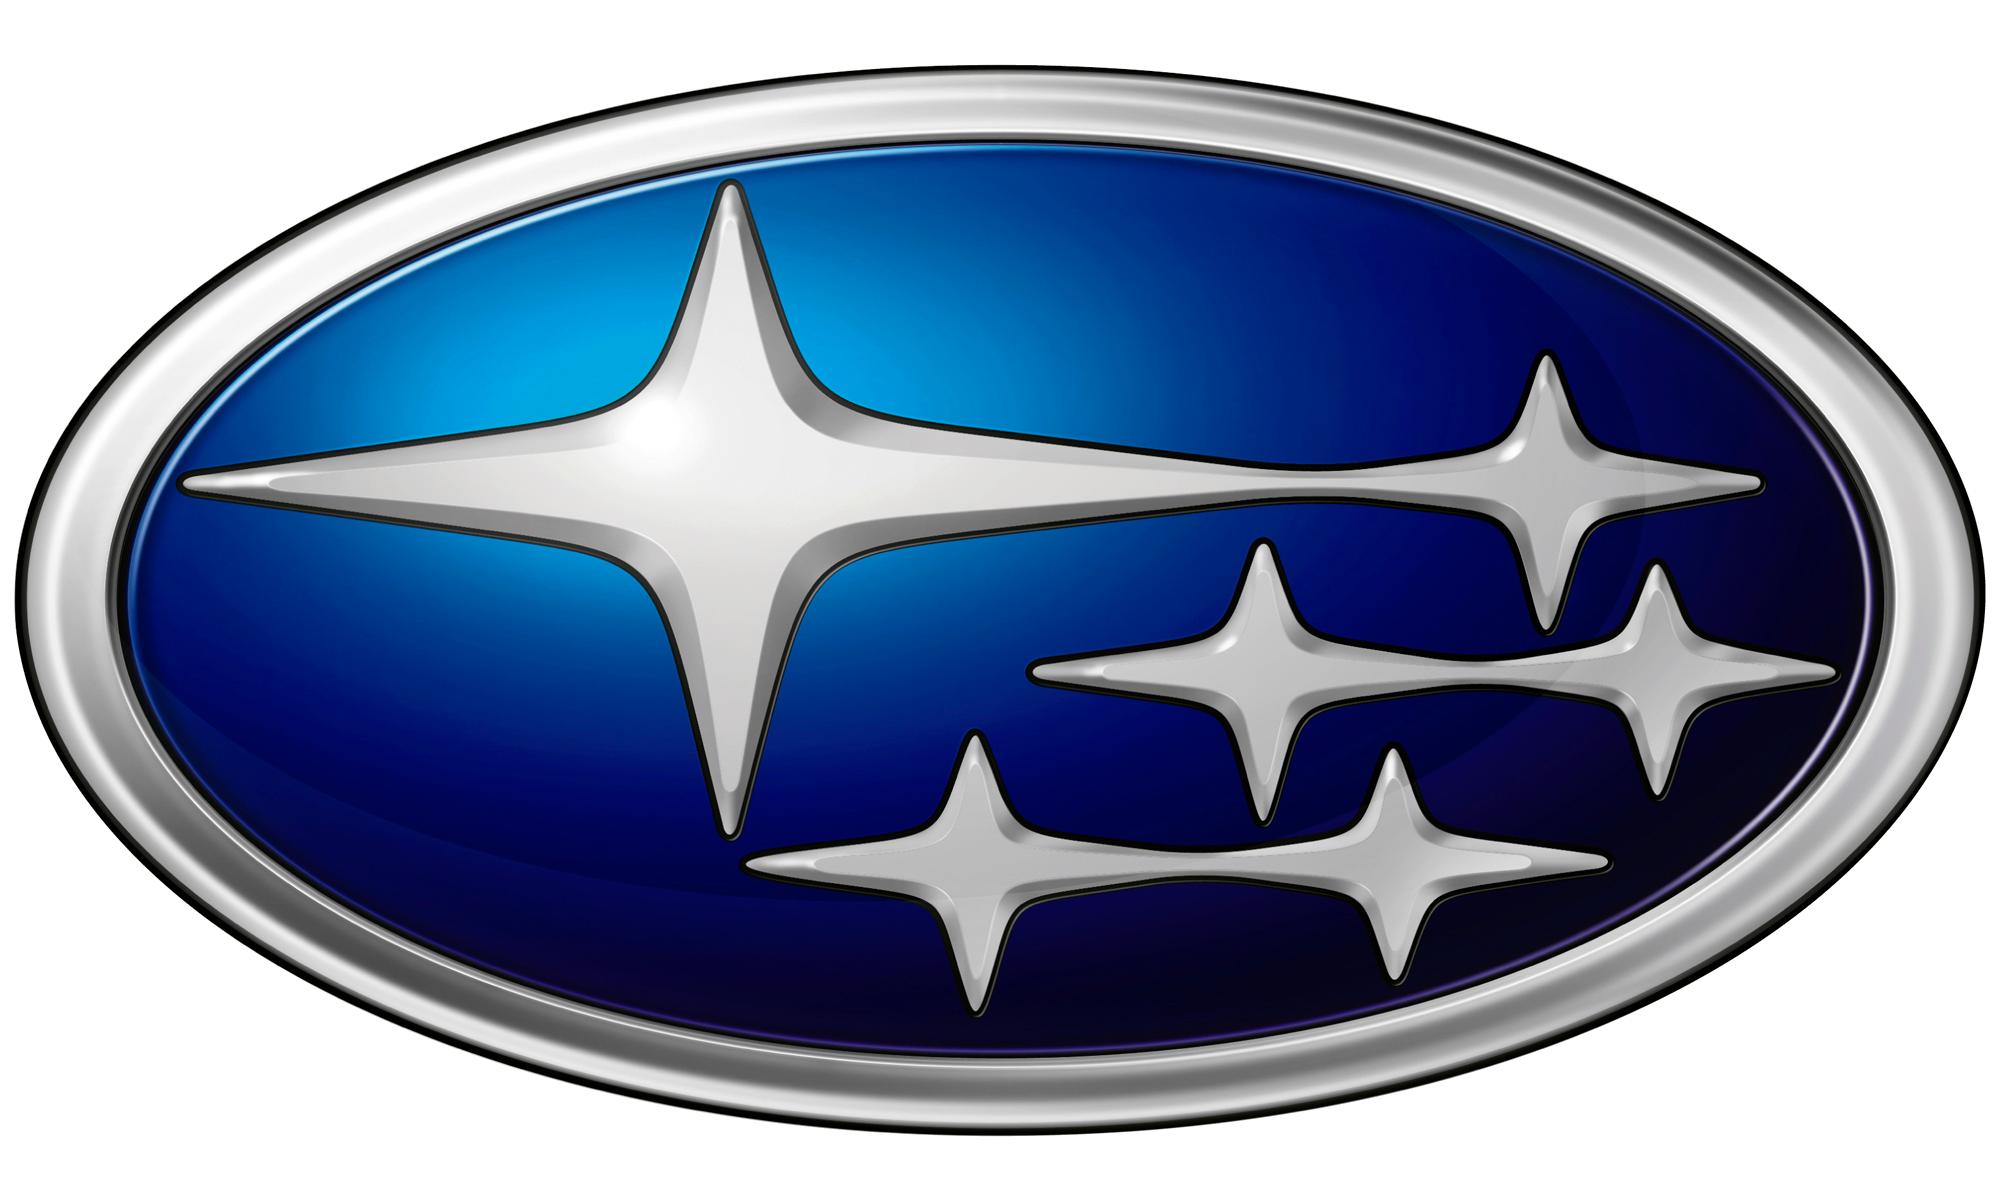 Субару лого PNG, Subaru car logo PNG